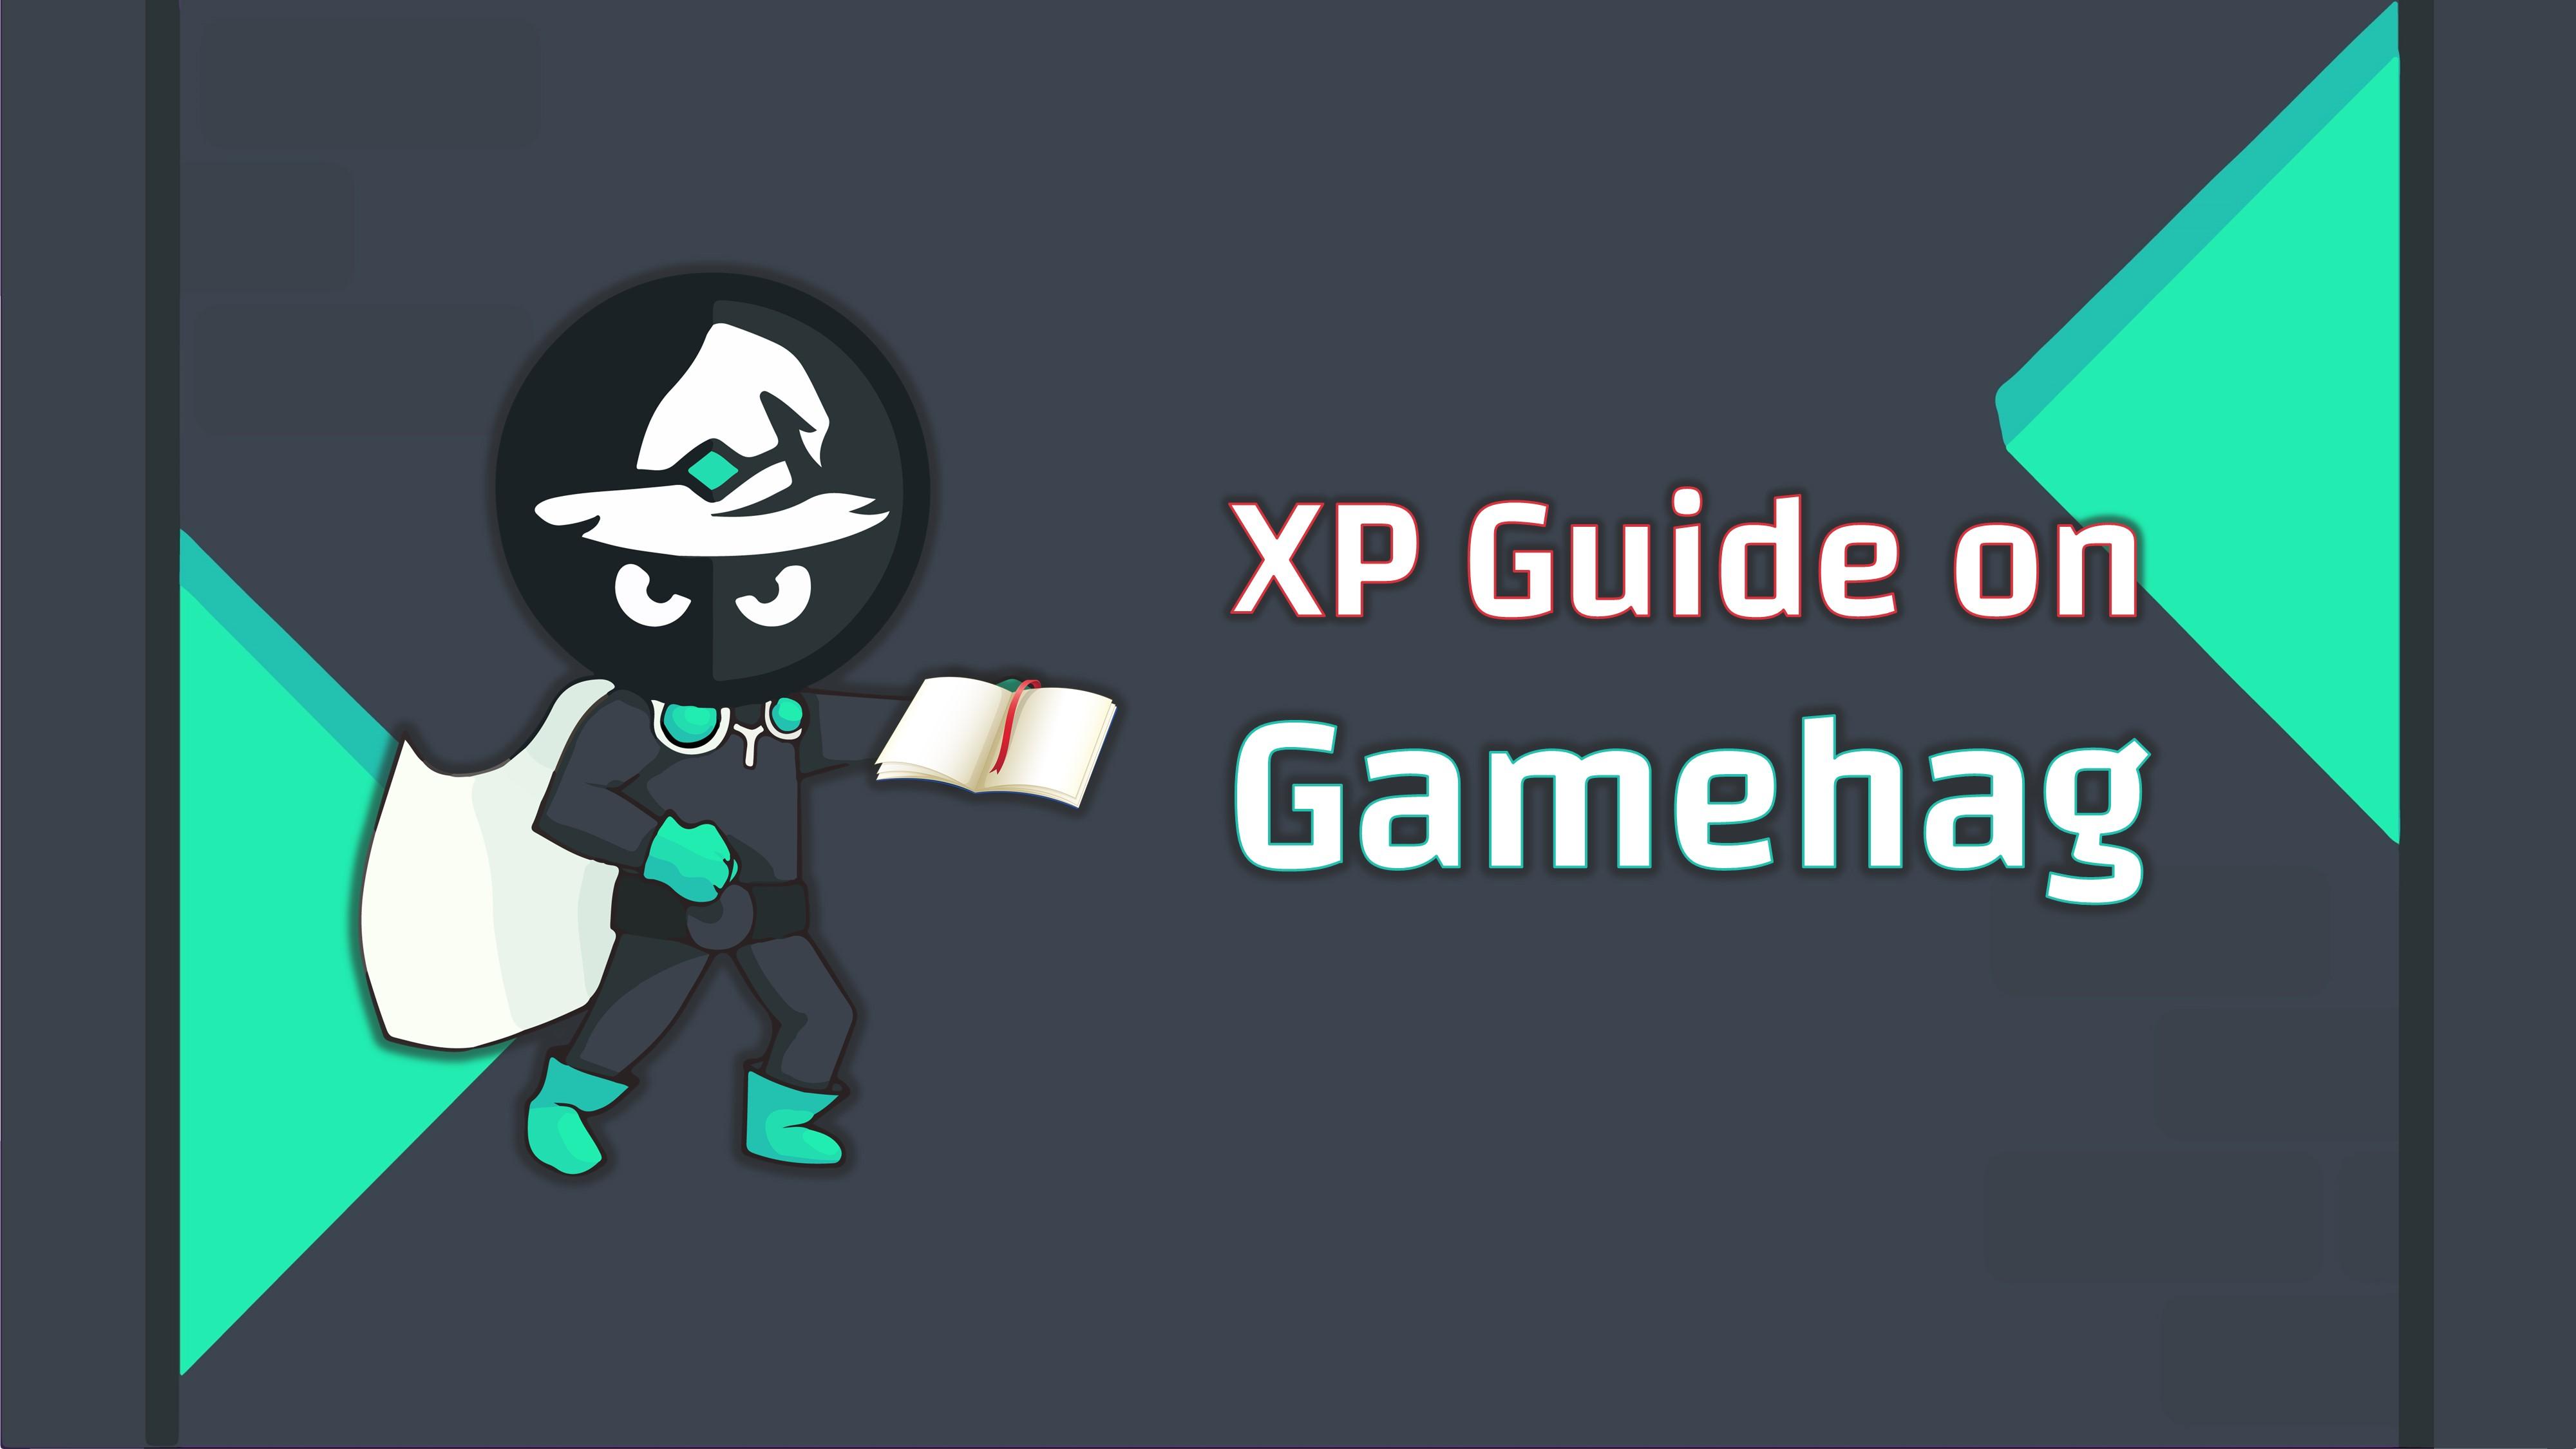 xp_guide_on_gamehag_wyz6.jpg